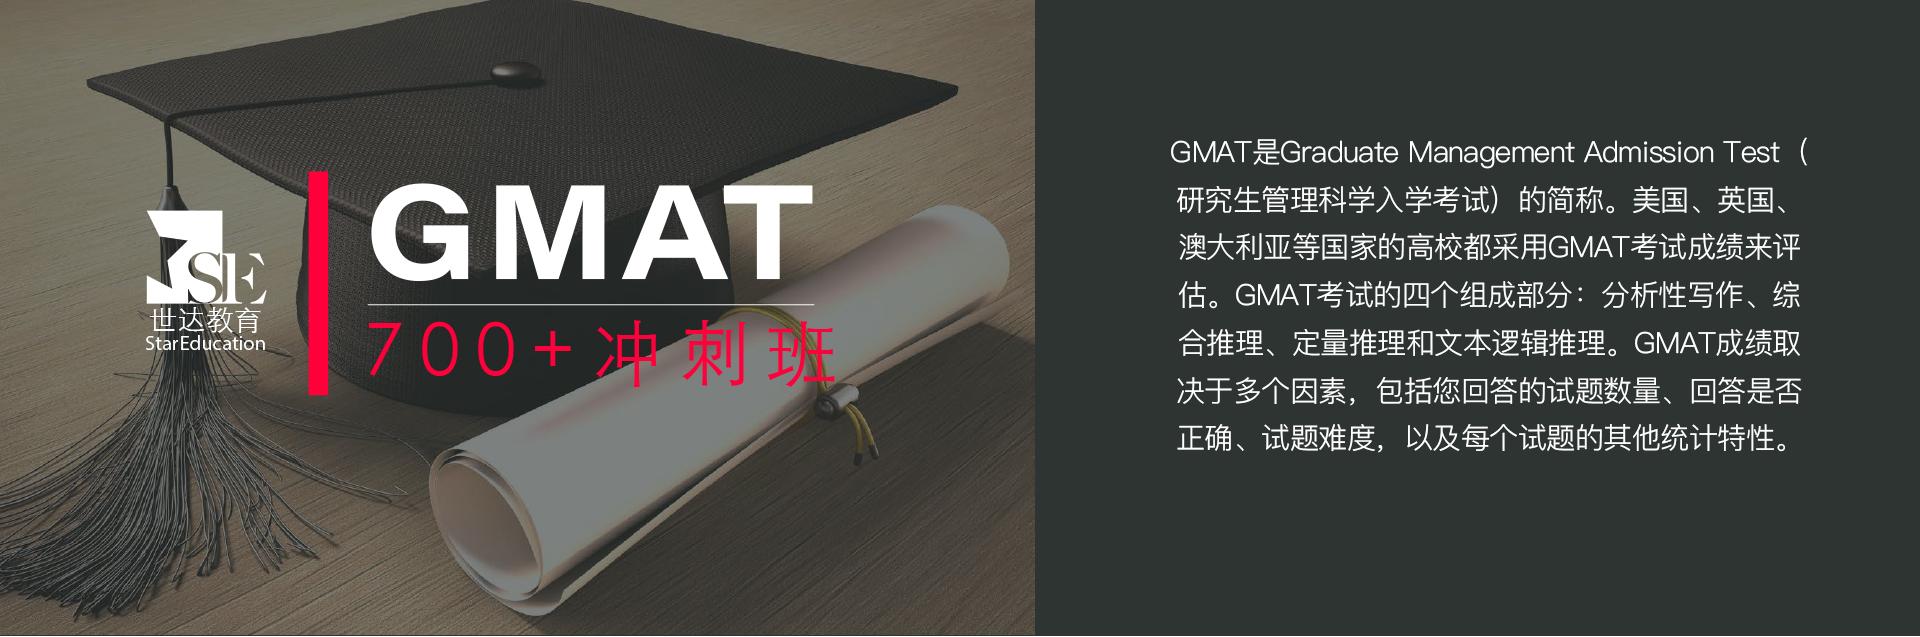 GMAT是Graduate Management Admission Test( 研究生管理科学入学考试)的简称。美国、英国、澳大利亚等国家的高校都采用GMAT考试成绩来评估。GMAT考试的四个组成部分:分析性写作、综合推理、定量推理和文本逻辑推理。GMAT成绩取决于多个因素,包括您回答的试题数量、回答是否正确、试题难度,以及每个试题的其他统计特性。